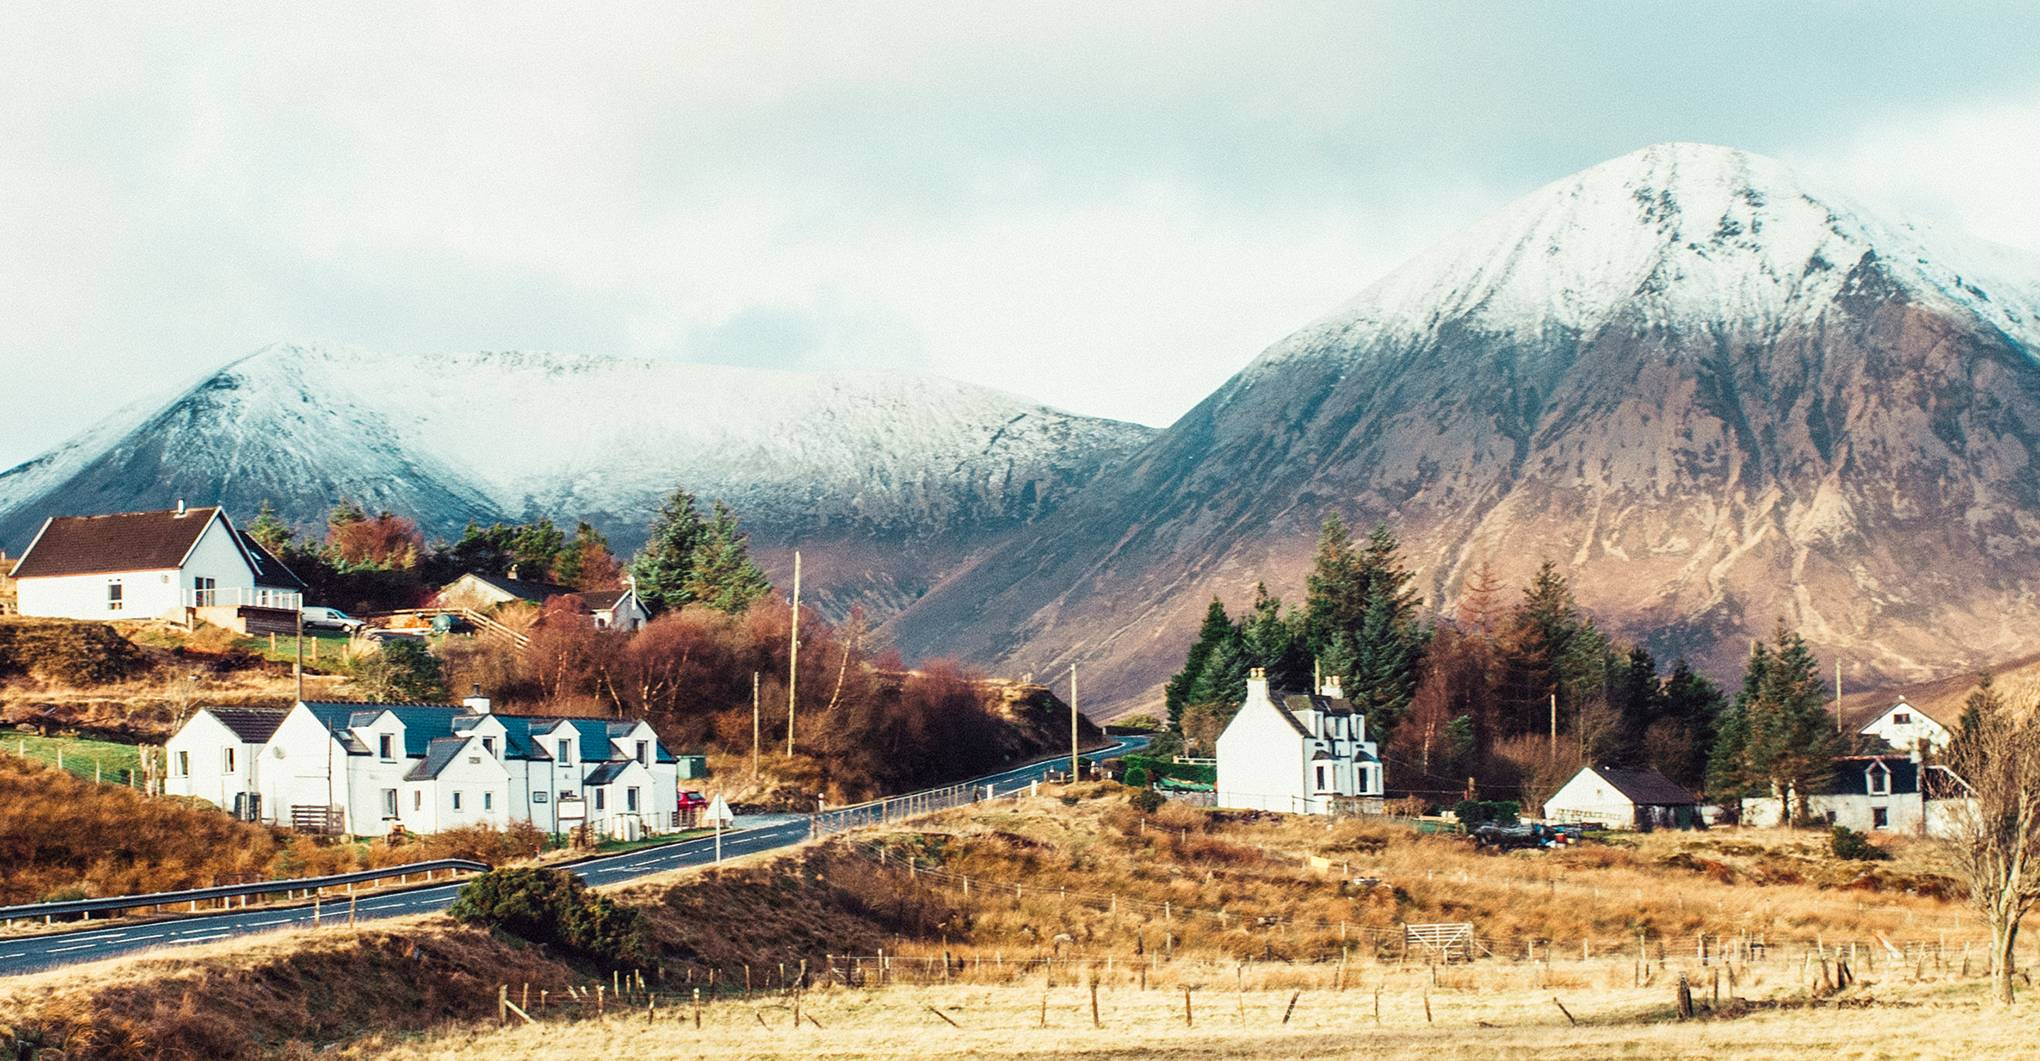 Isle of Skye | Things to do